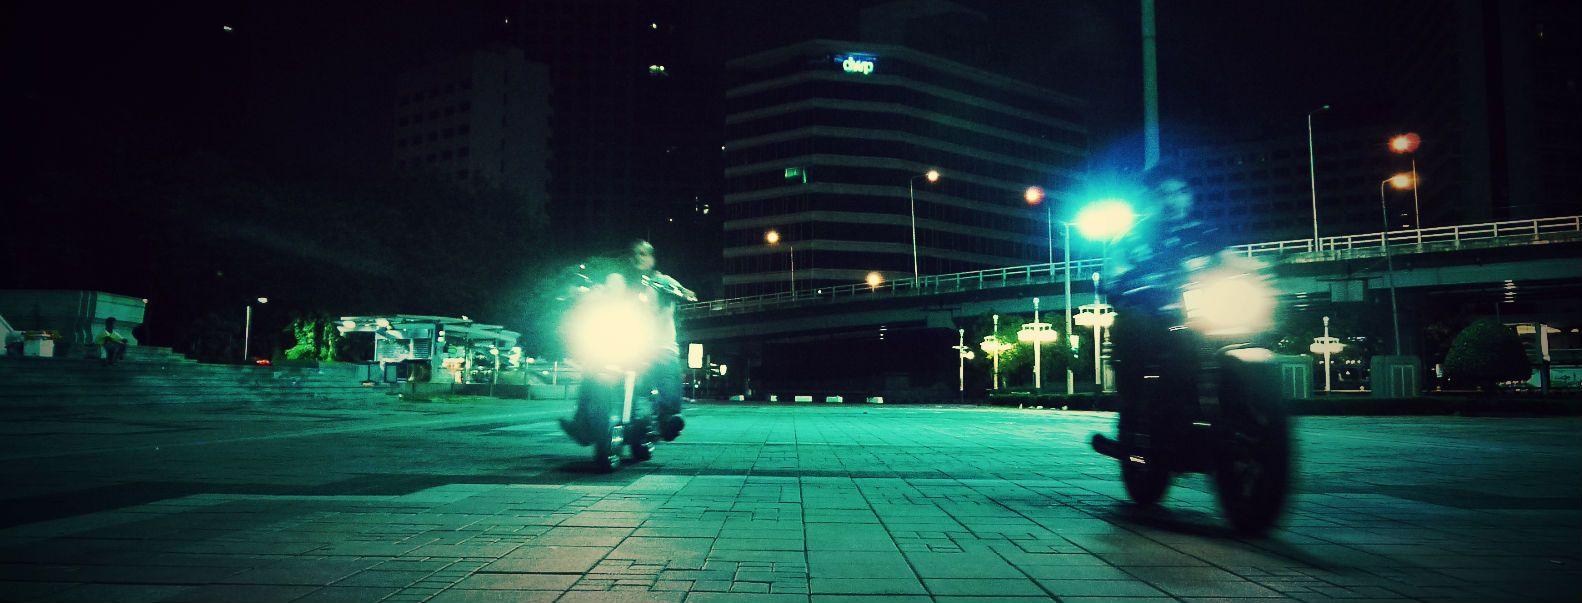 #BangkokNightLife #SiameseMotorcycles #MidnightRun